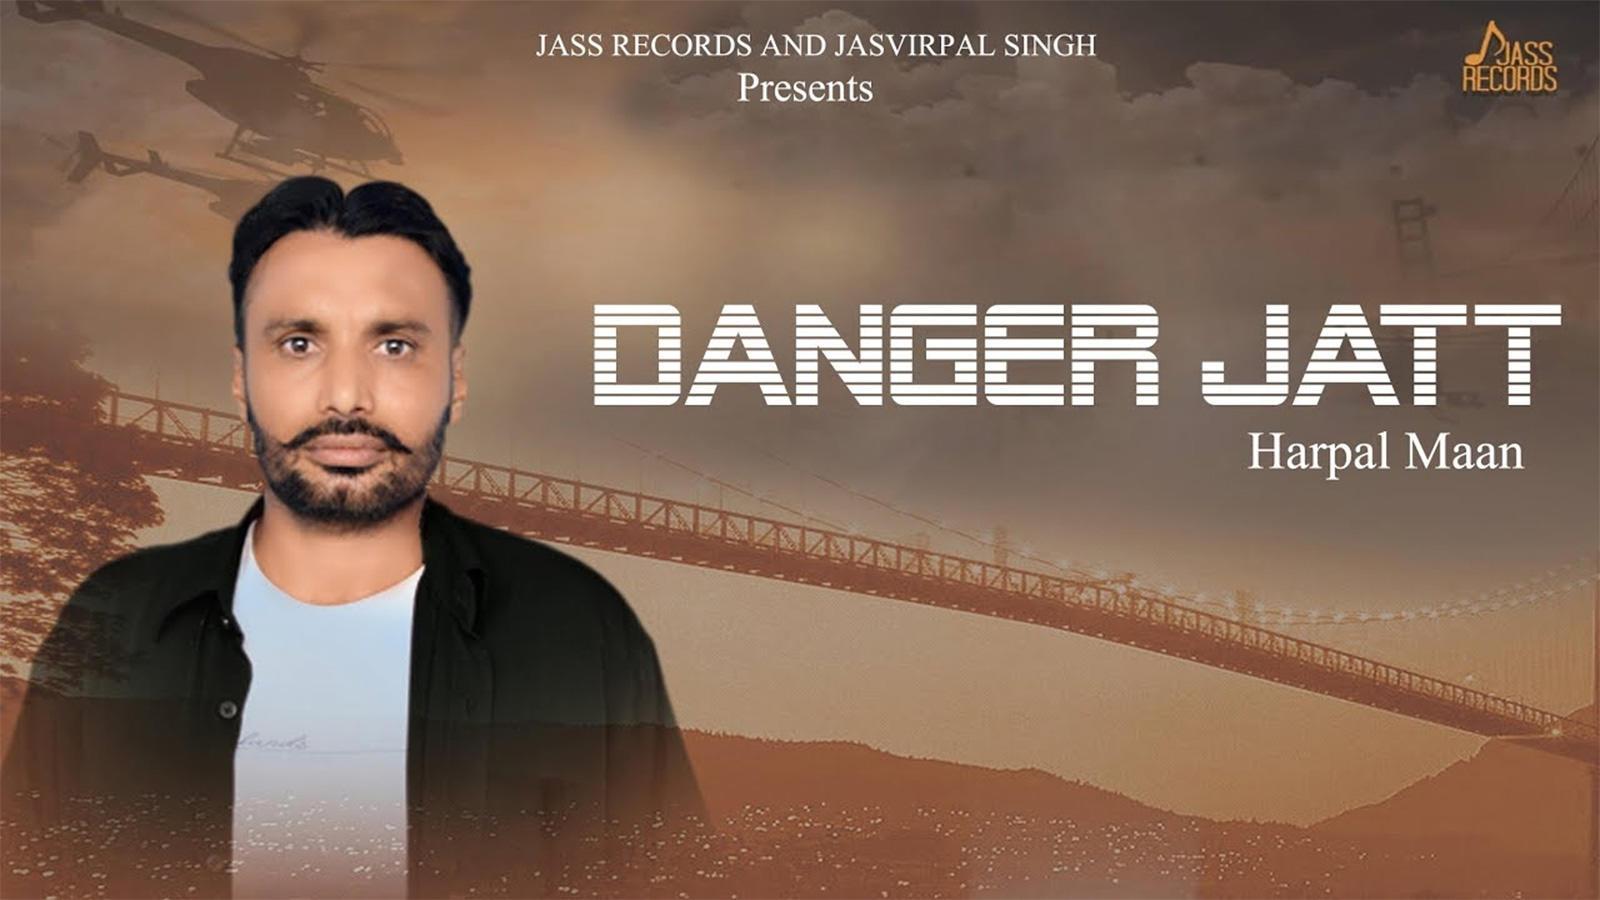 Latest Punjabi Song 'Danger Jatt' Sung By Harpal Maan